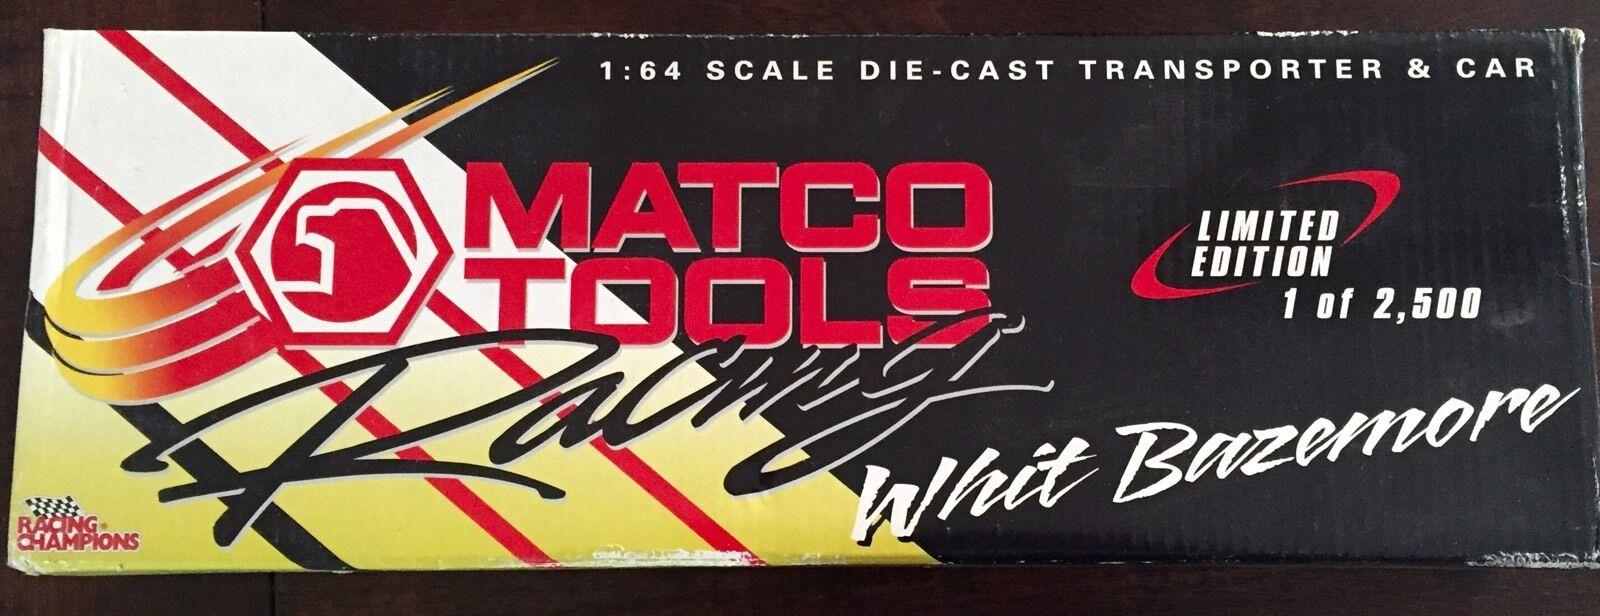 Racing Champions Matco Tools Whit Bazemore 1 64 Transporter Funny Car Hauler